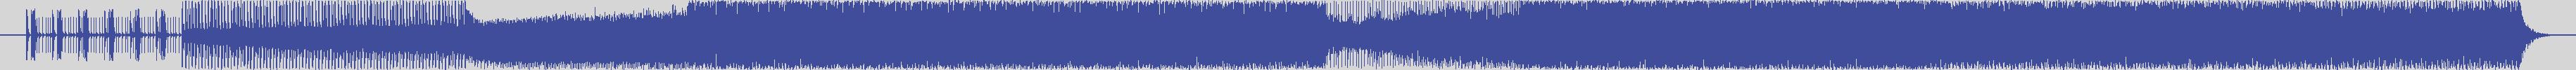 just_digital_records [JS1186] Malden - Over Money Time [Original Mix] audio wave form